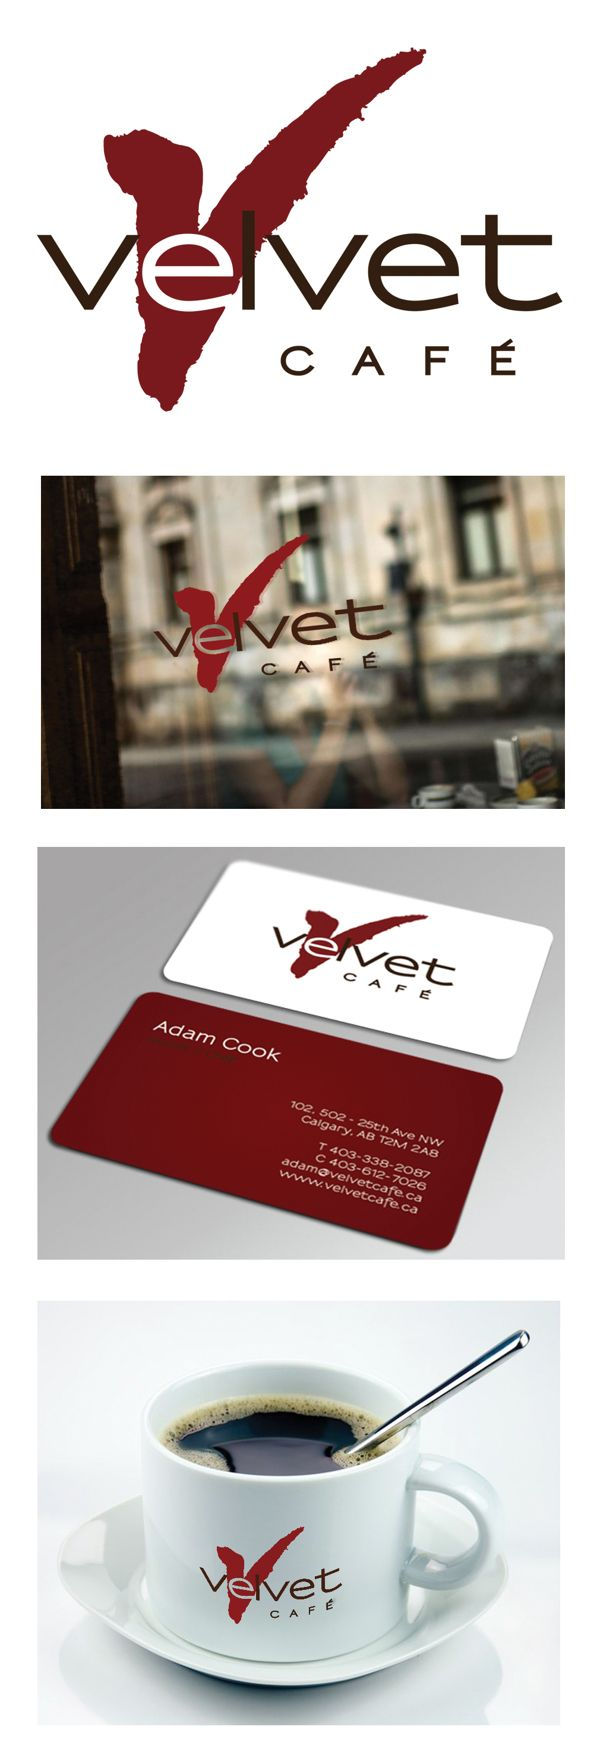 Client: Velvet Cafe, Calgary AB. Logo and Business Card design